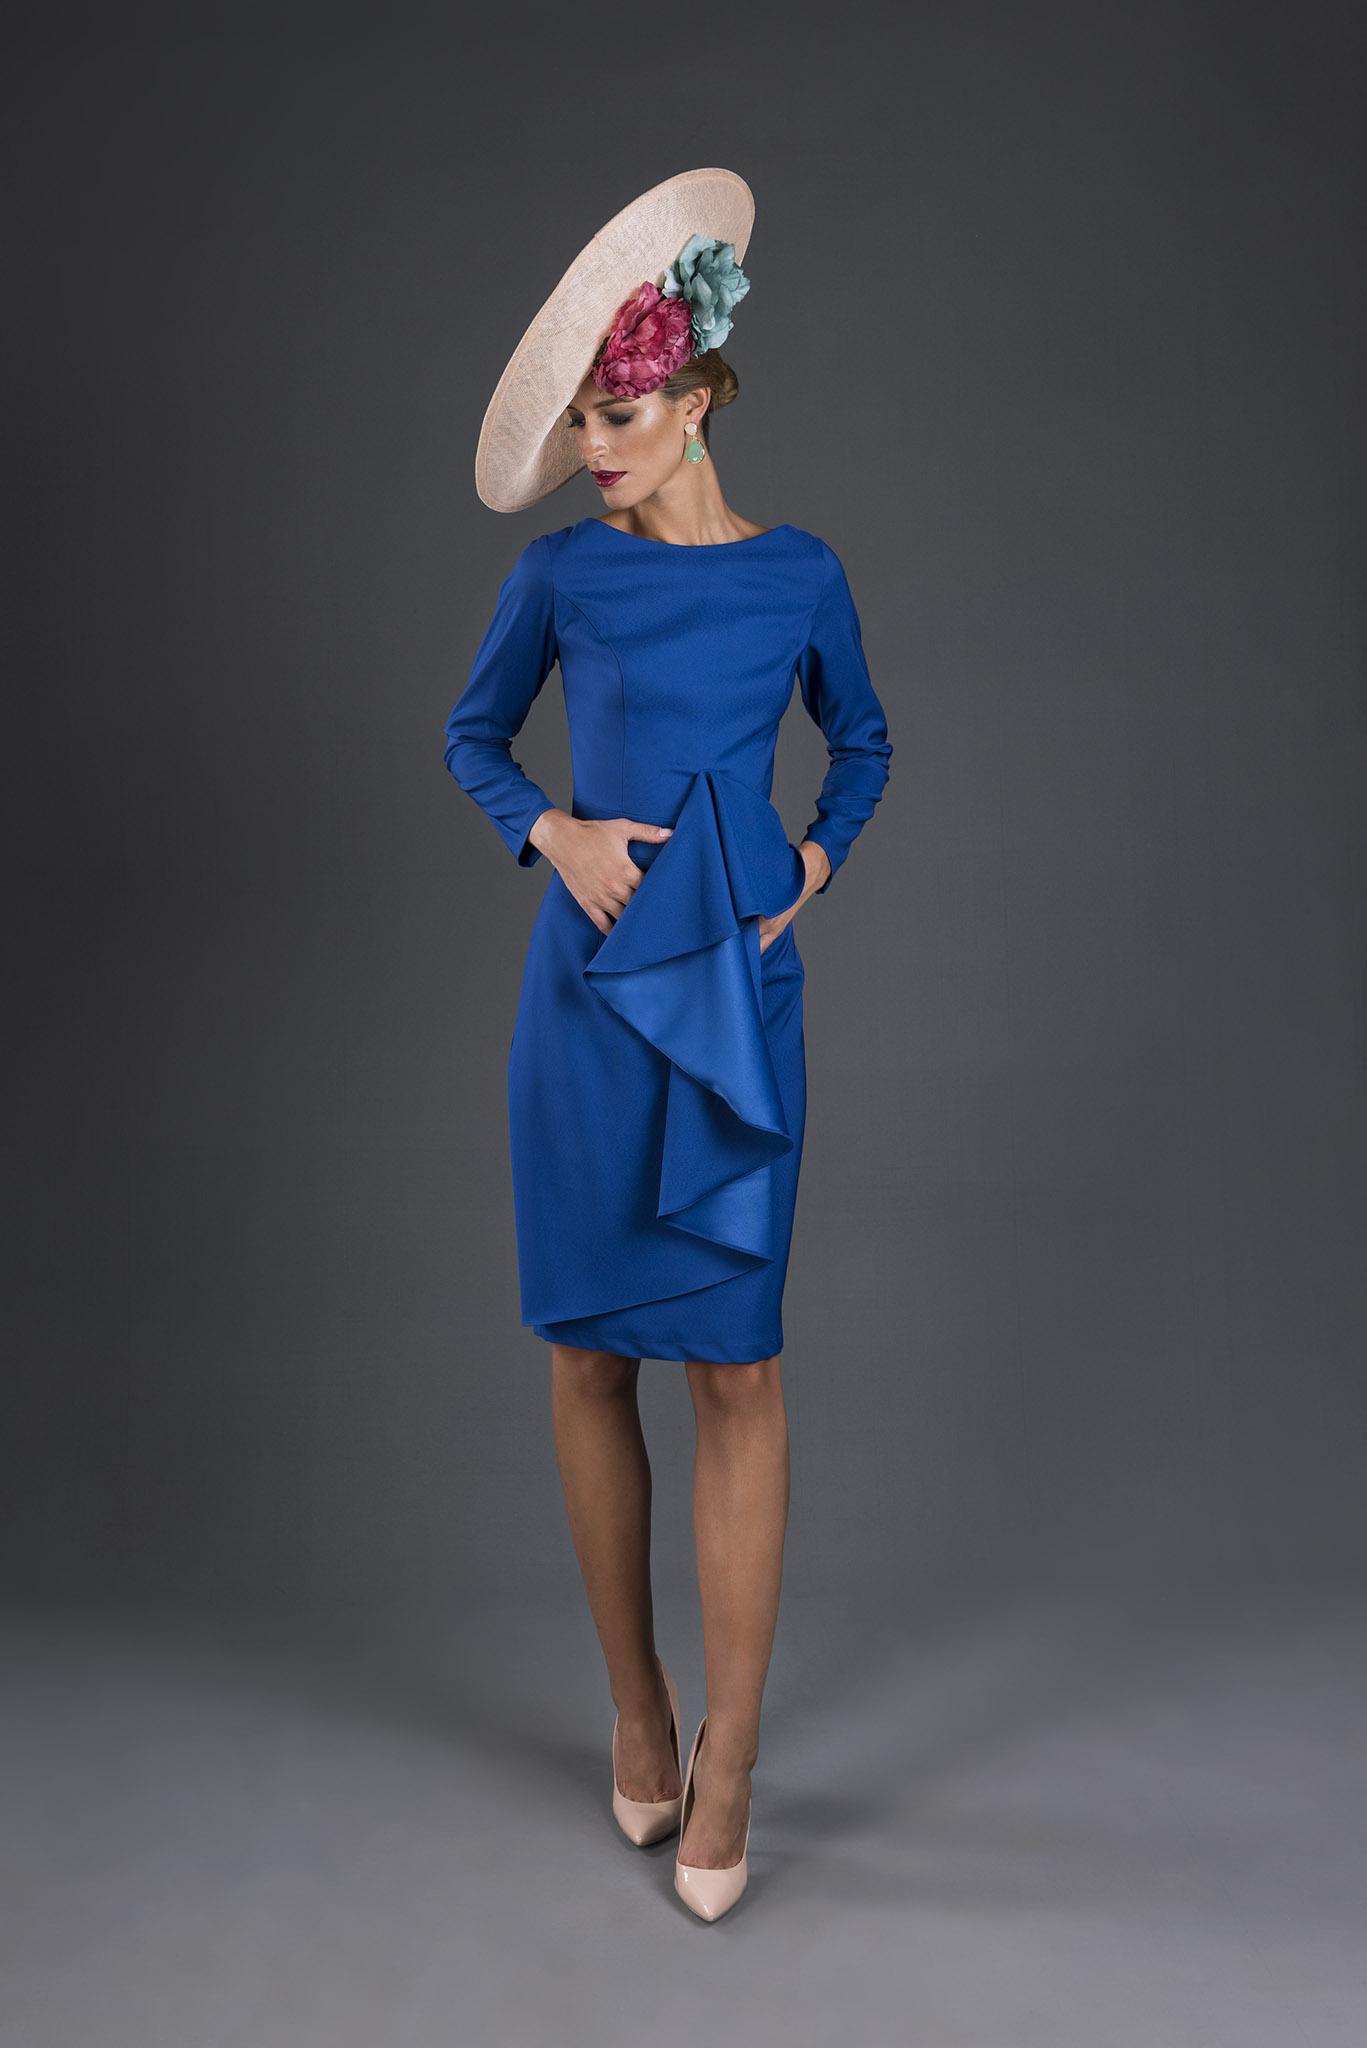 margarita muñoz vestido